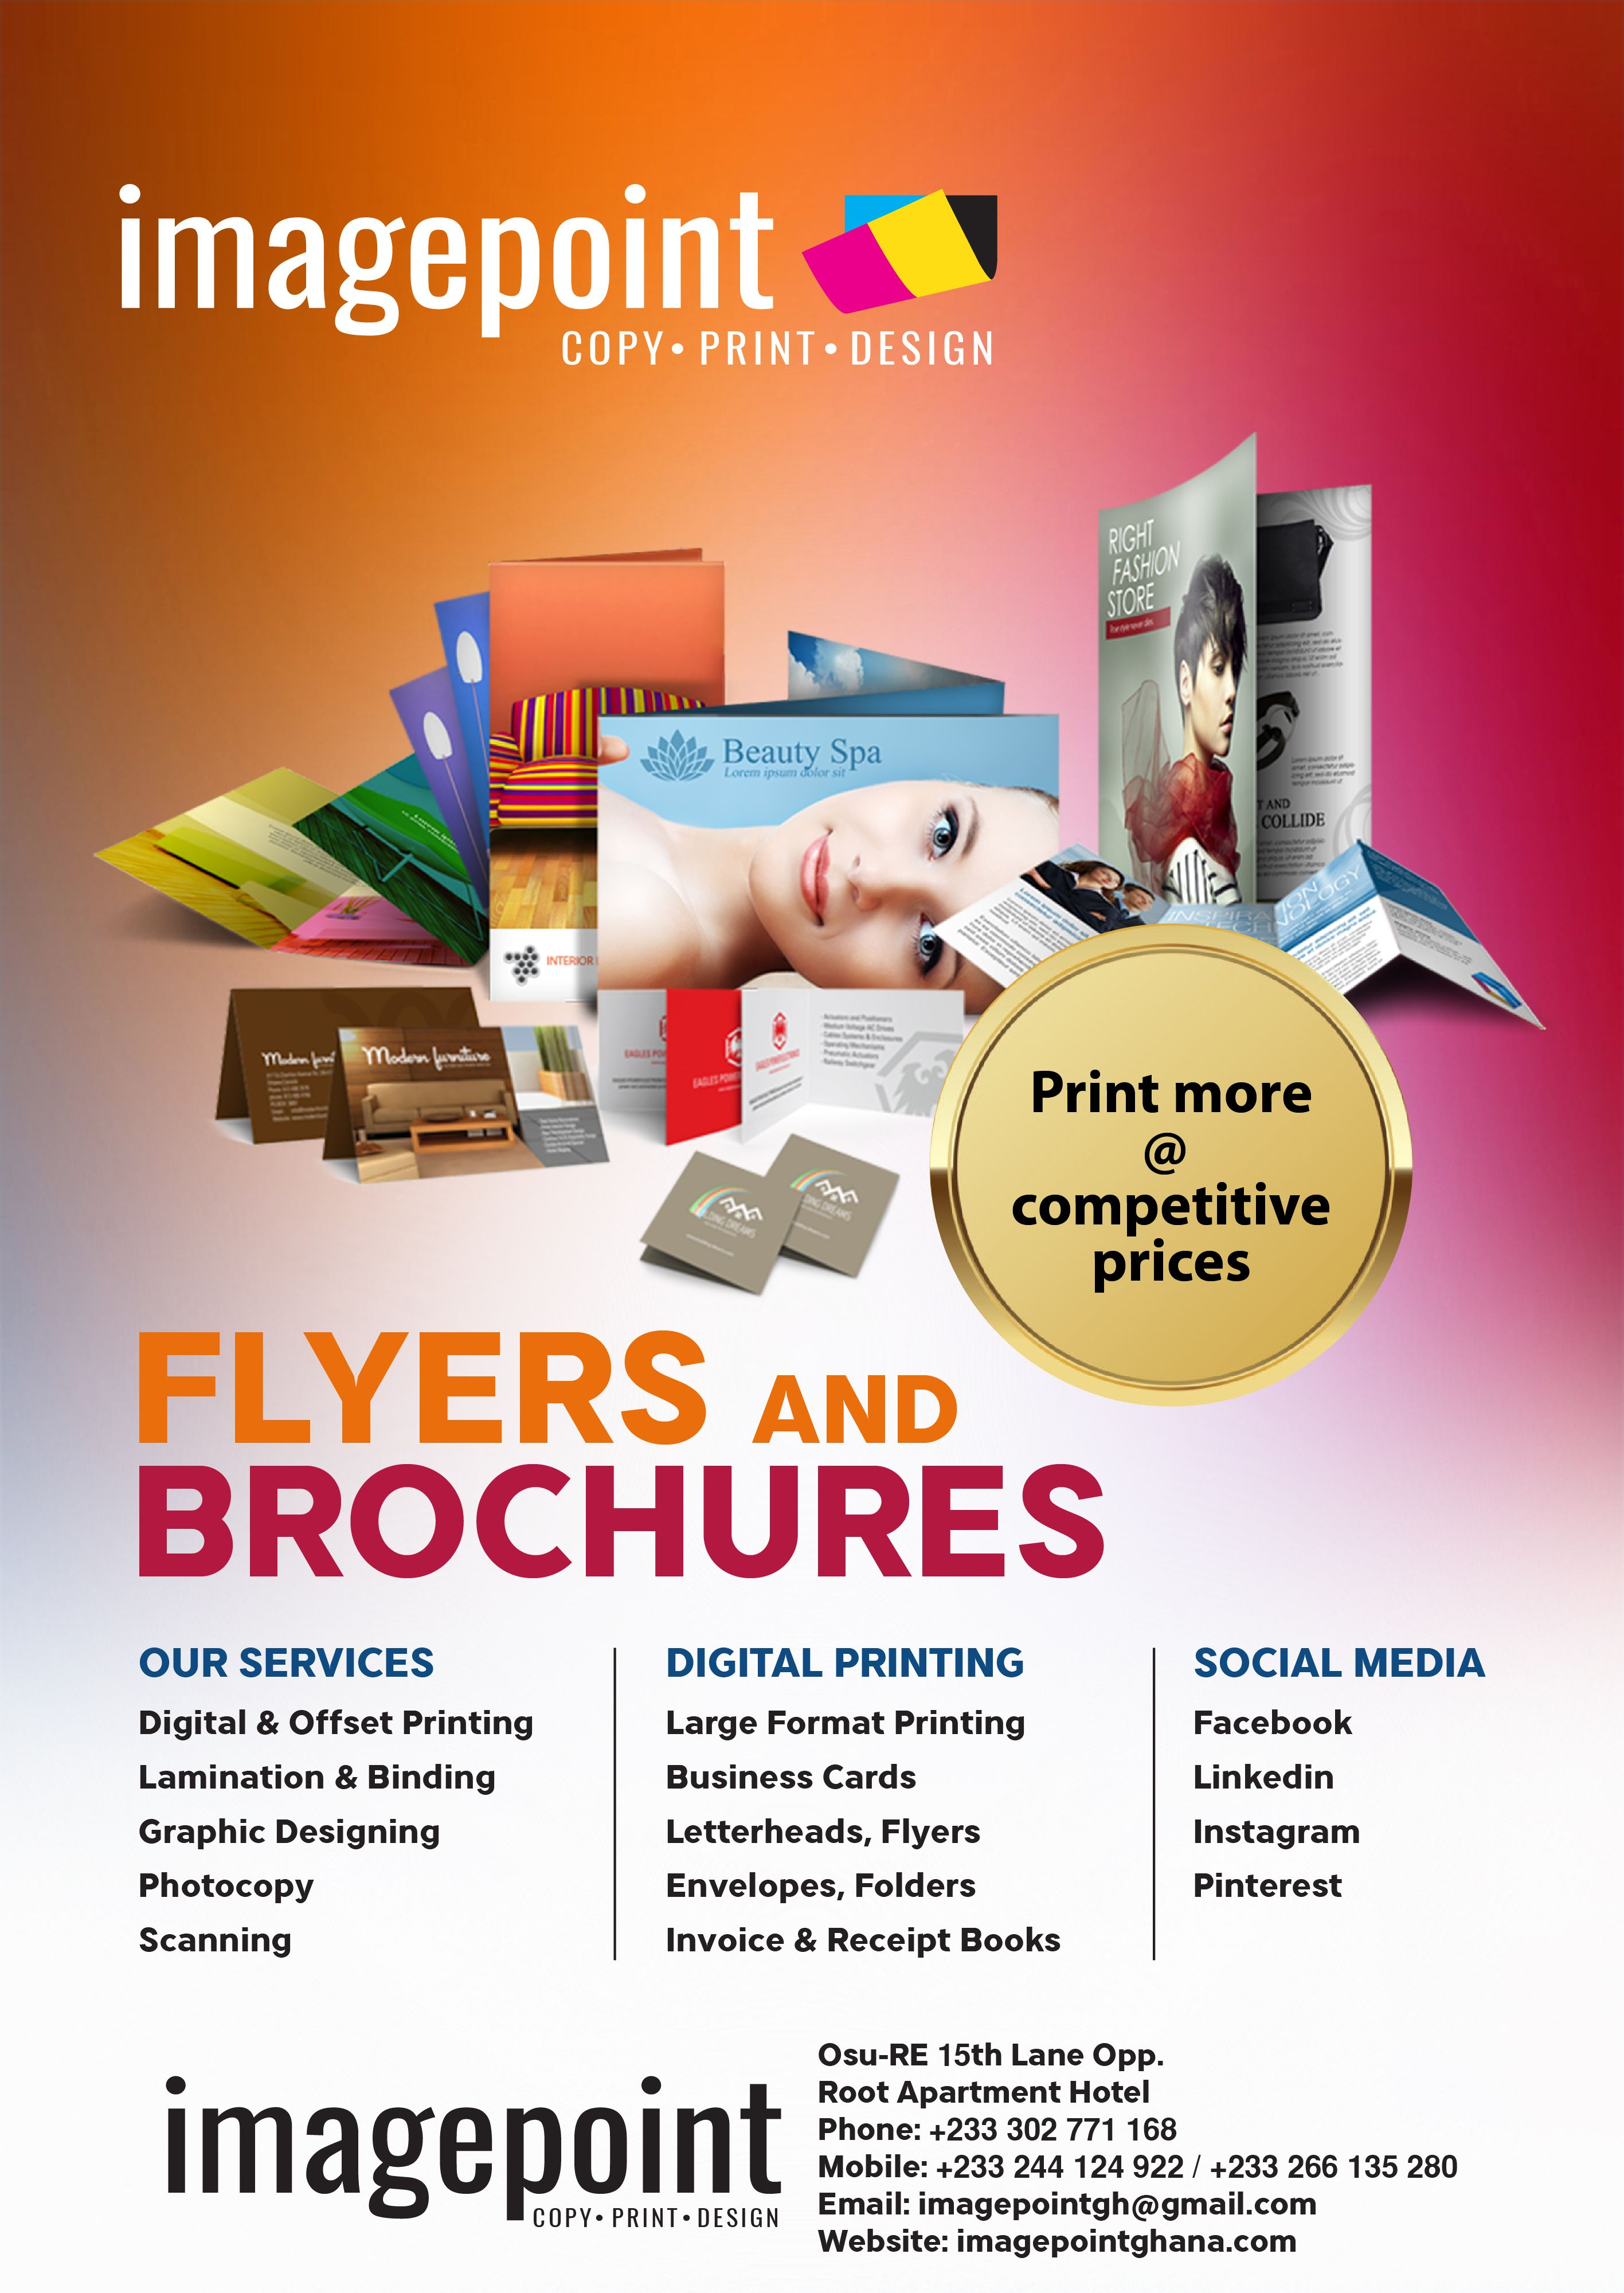 Digitalprint Flyers Folders Envelopes Invitationcards Brochures Letterheads Printing Food Poster Design Flyer Facebook Print